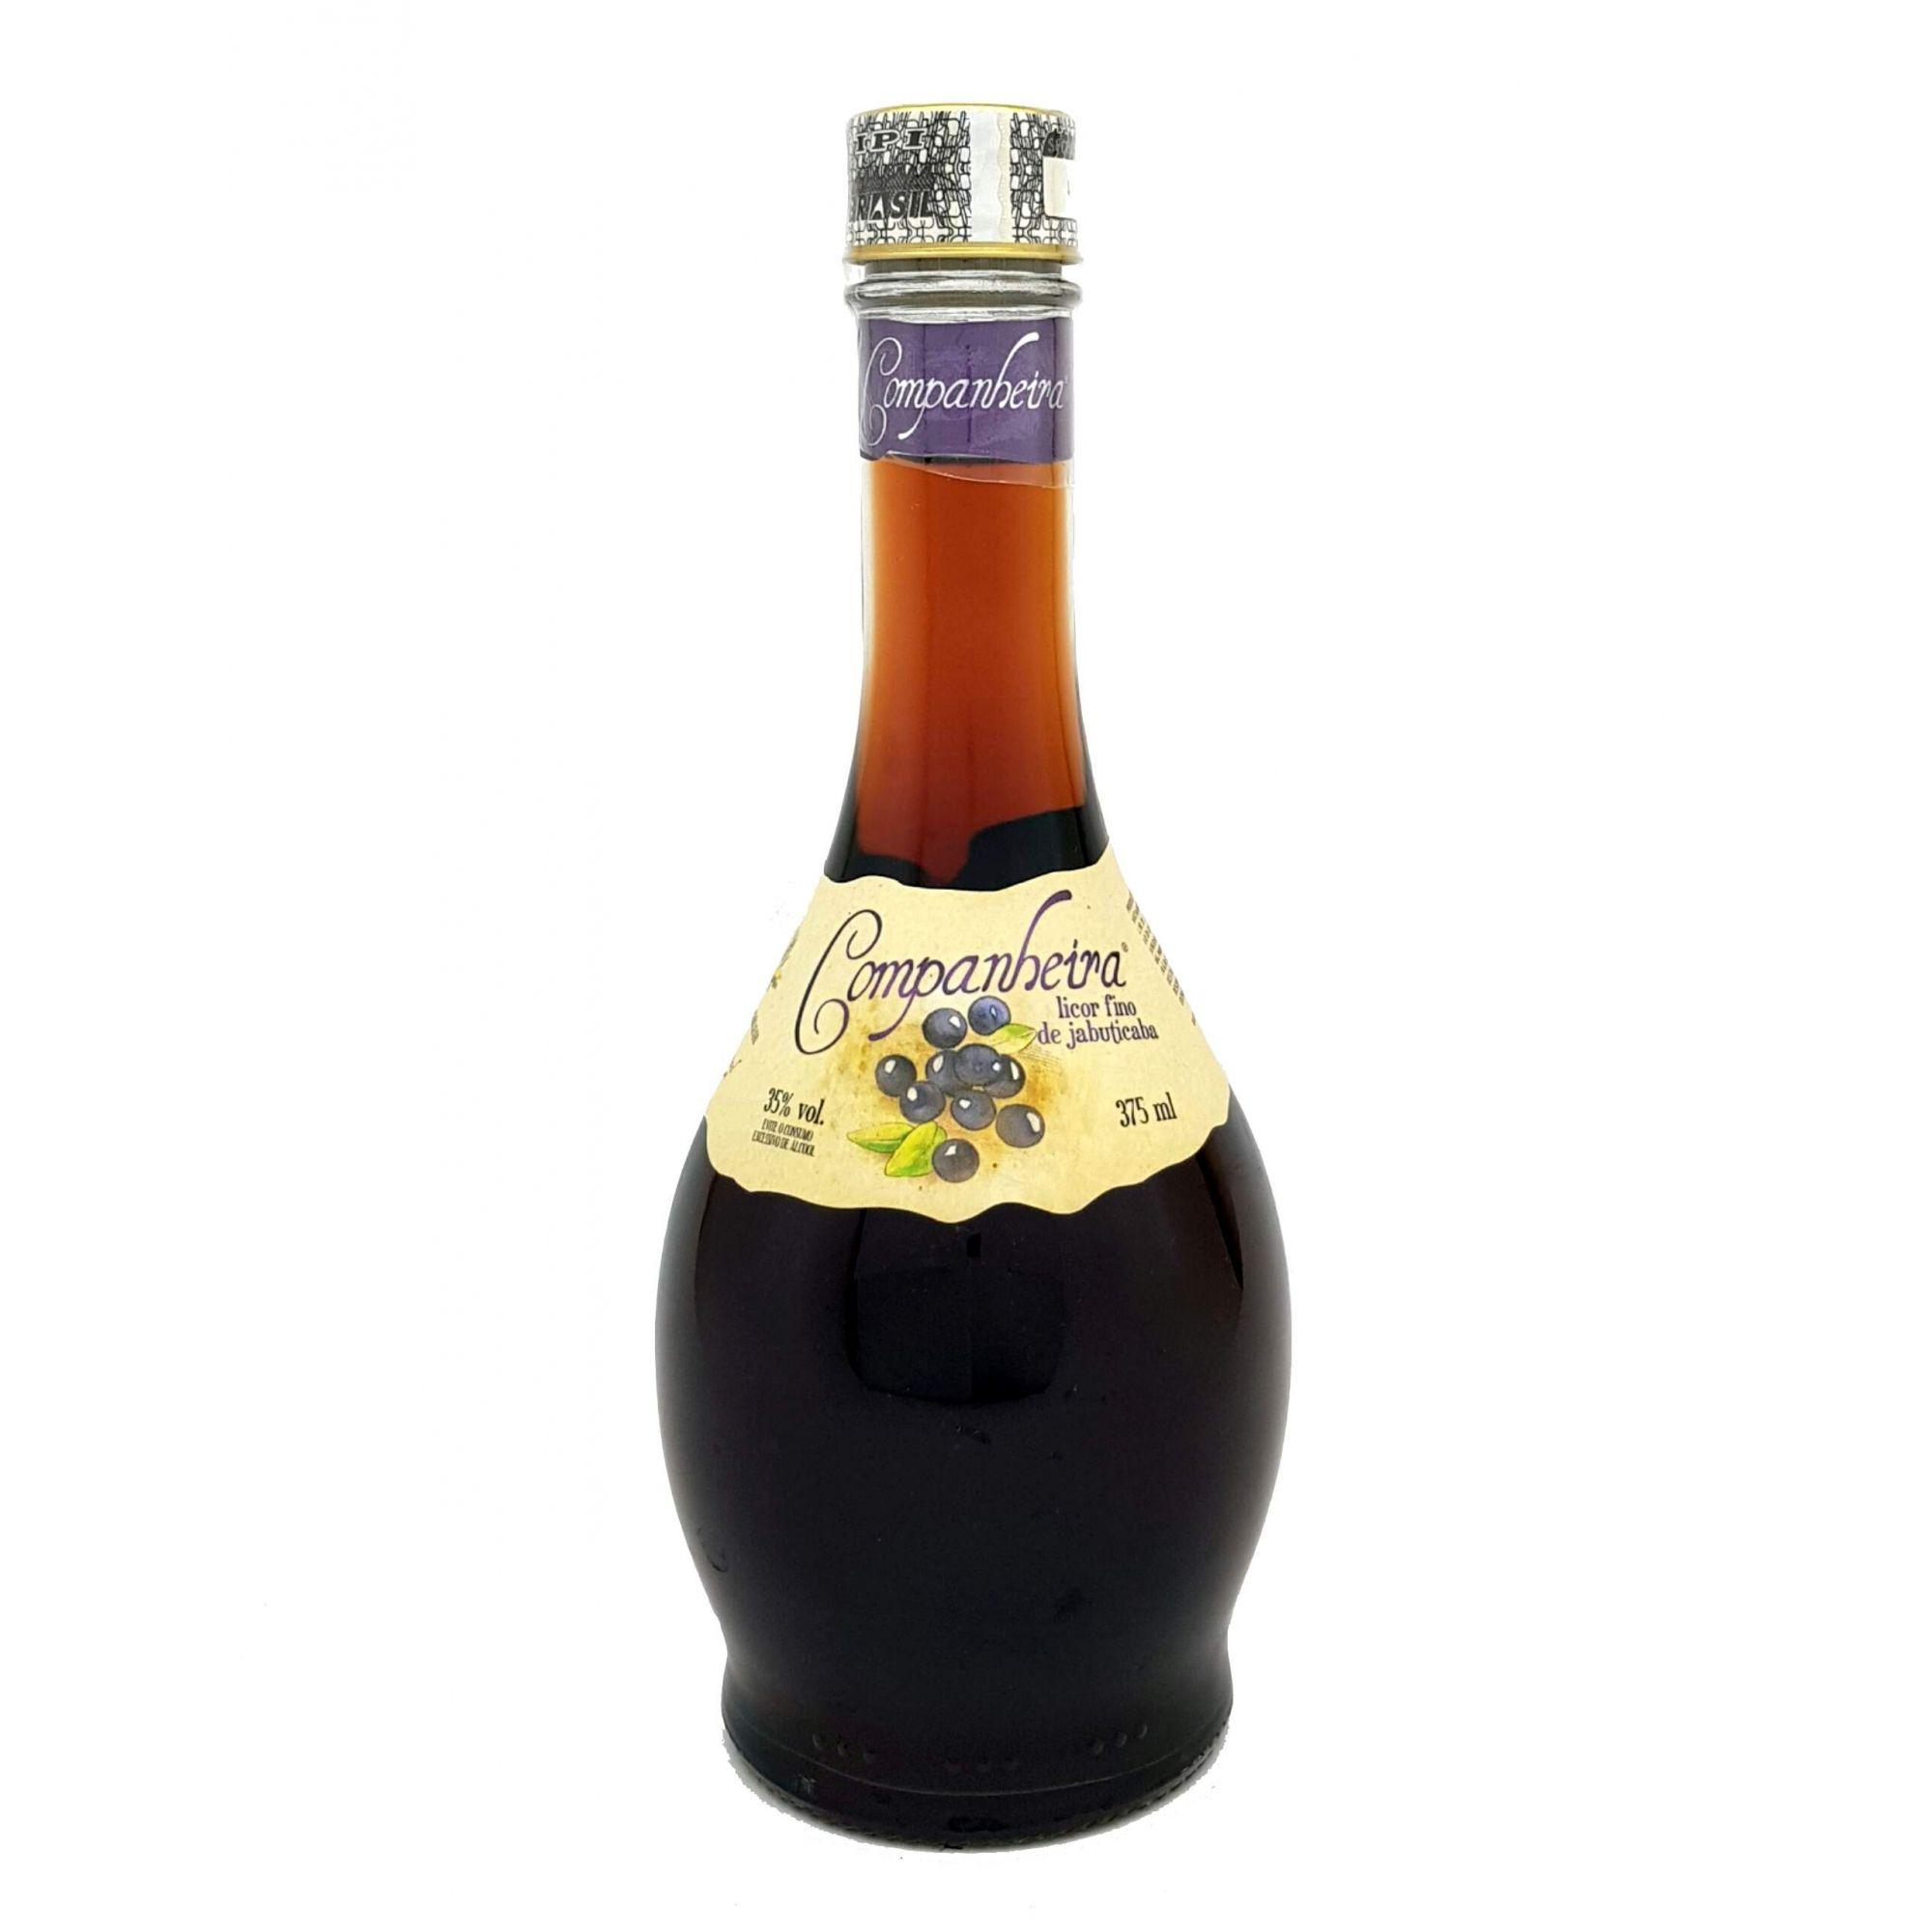 Licor Fino de Jabuticaba Companheira 375ml